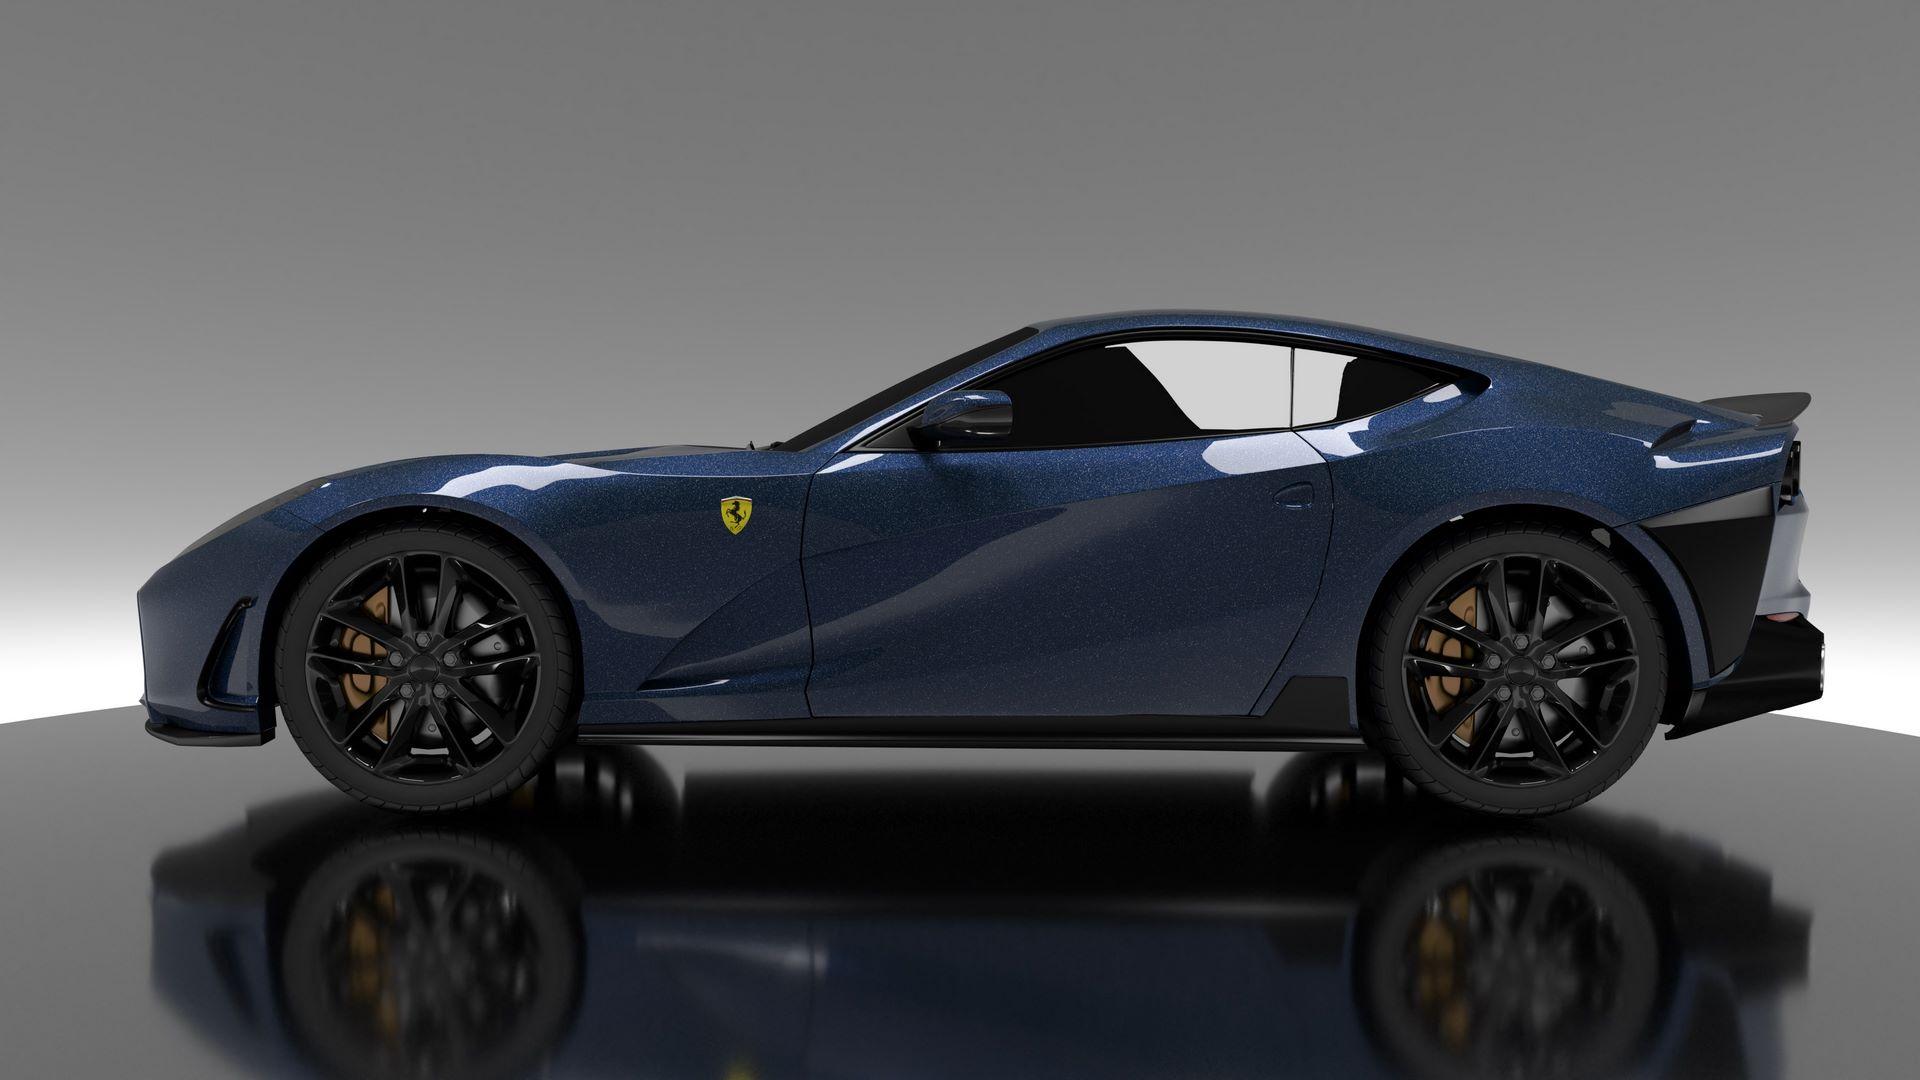 Ferrari-812-Superfast-Spia-by-DMC-4